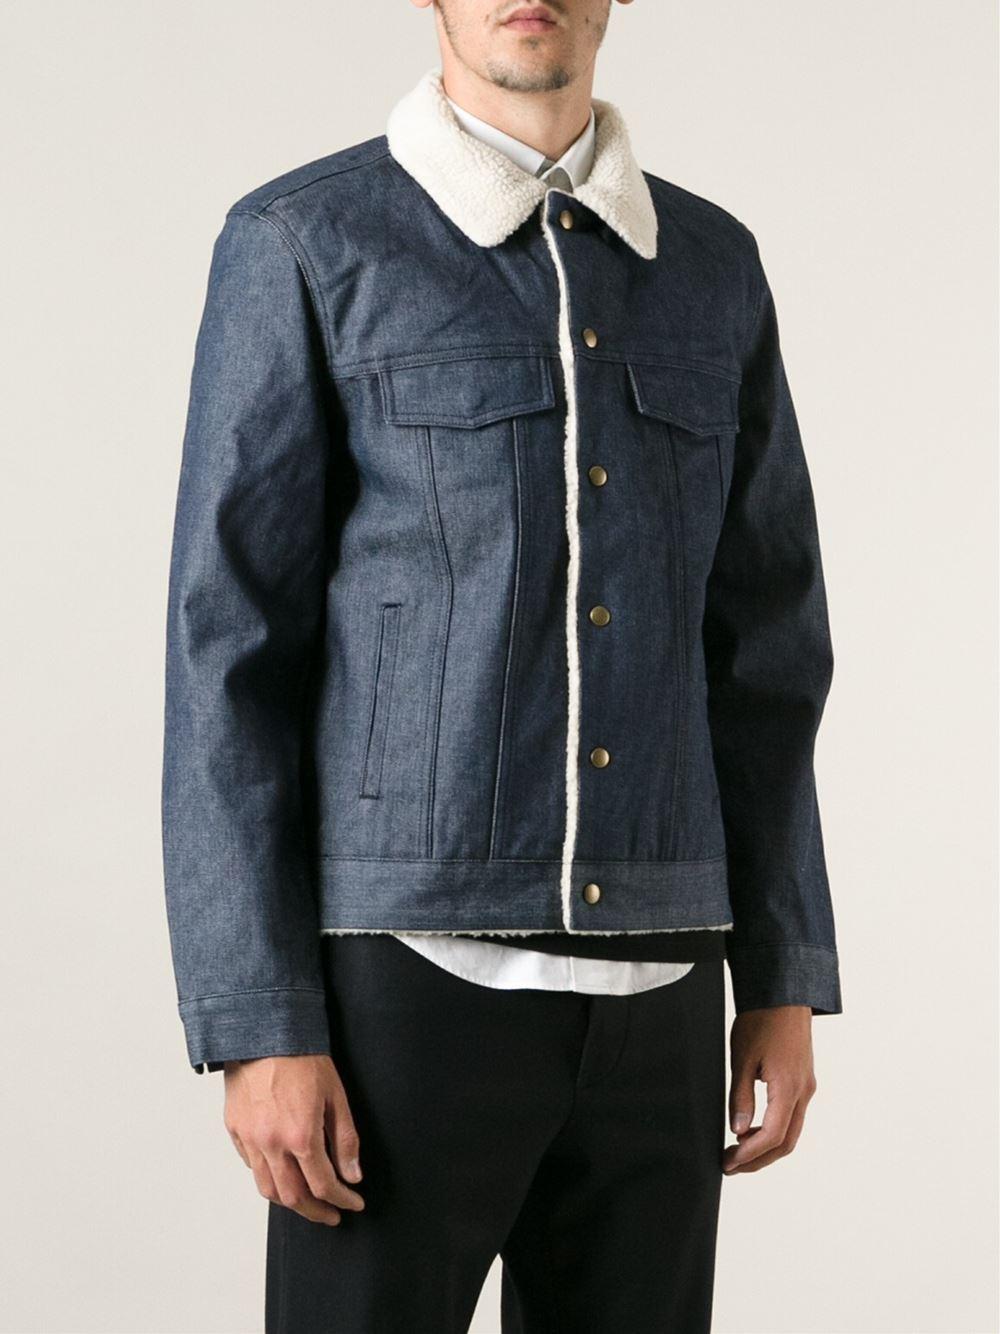 Apc denim jacket sale – Modern fashion jacket photo blog